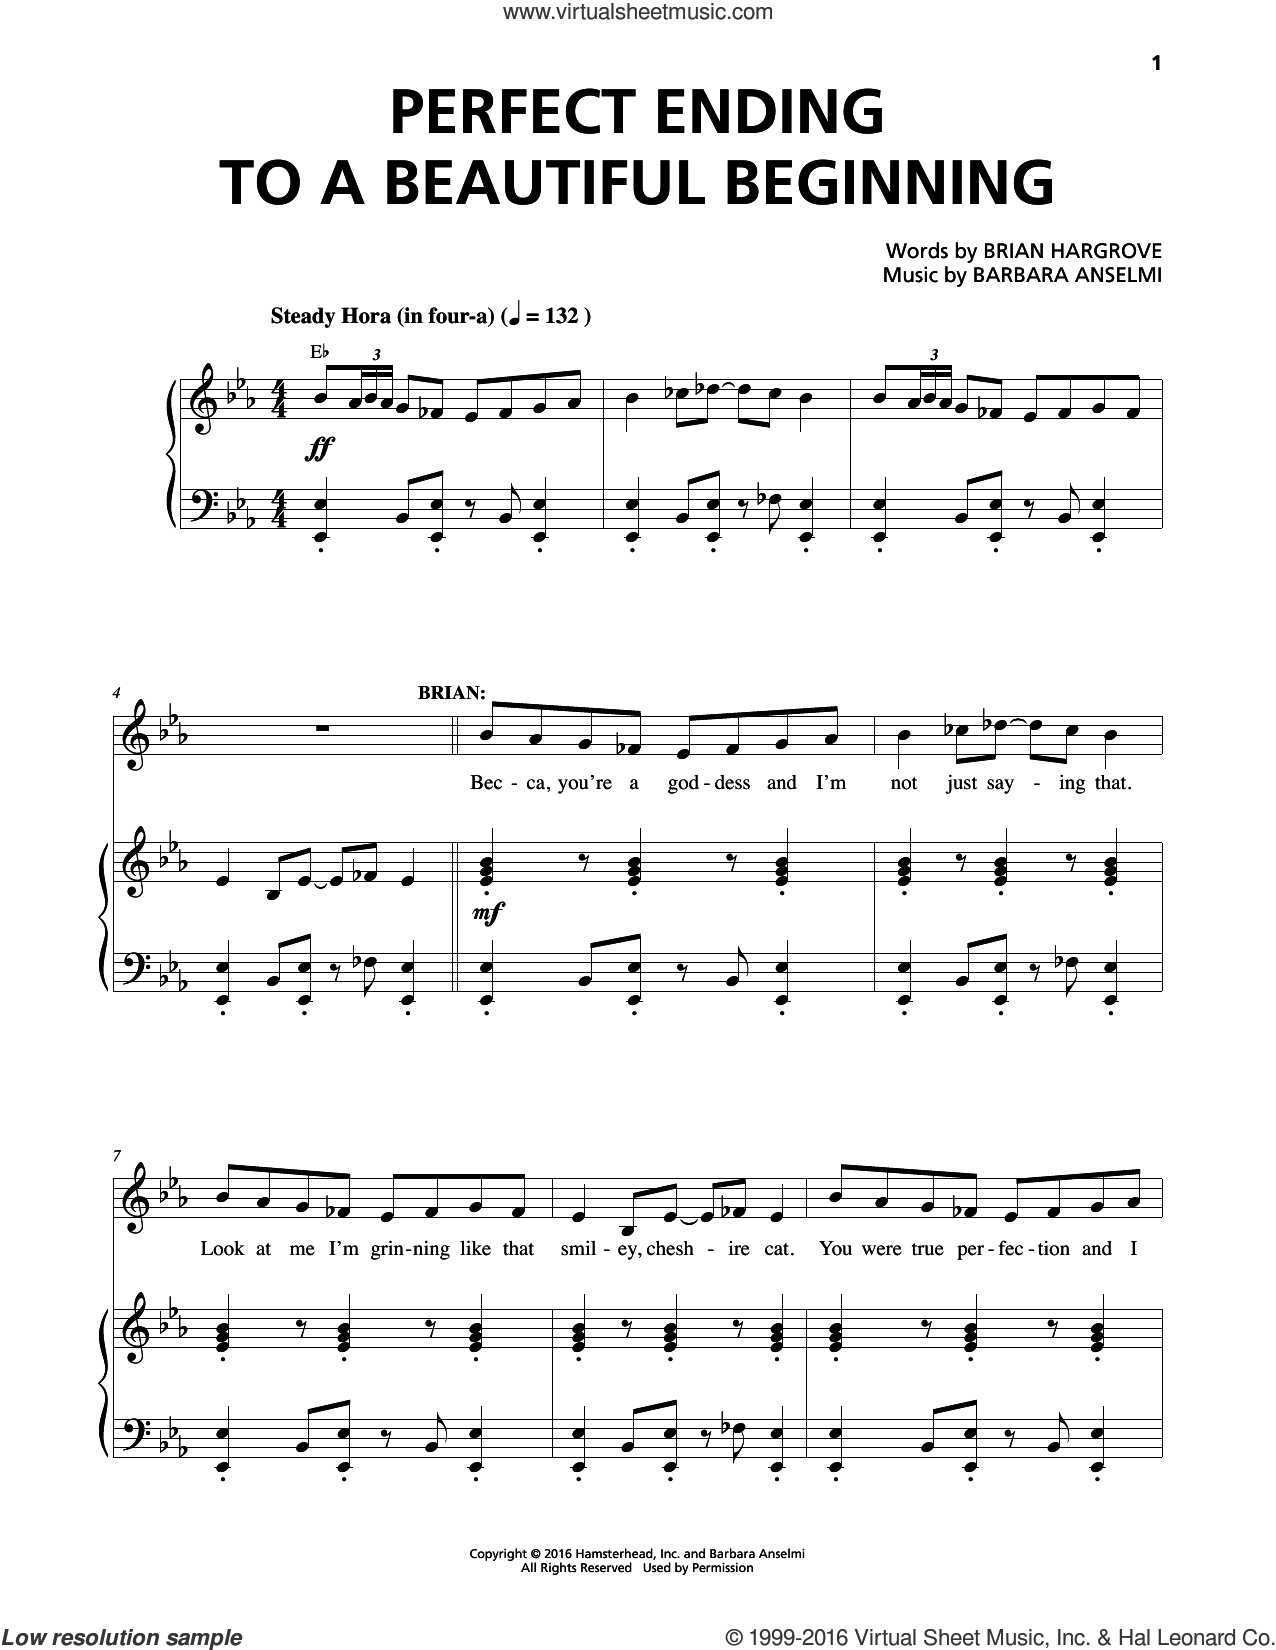 Perfect Ending To A Beautiful Beginning sheet music for voice and piano by Full Shoulda Company, Barbara Anselmi, Barbara Anselmi and Brian Hargrove, Brian Hargrove and Lisa Howard, intermediate skill level